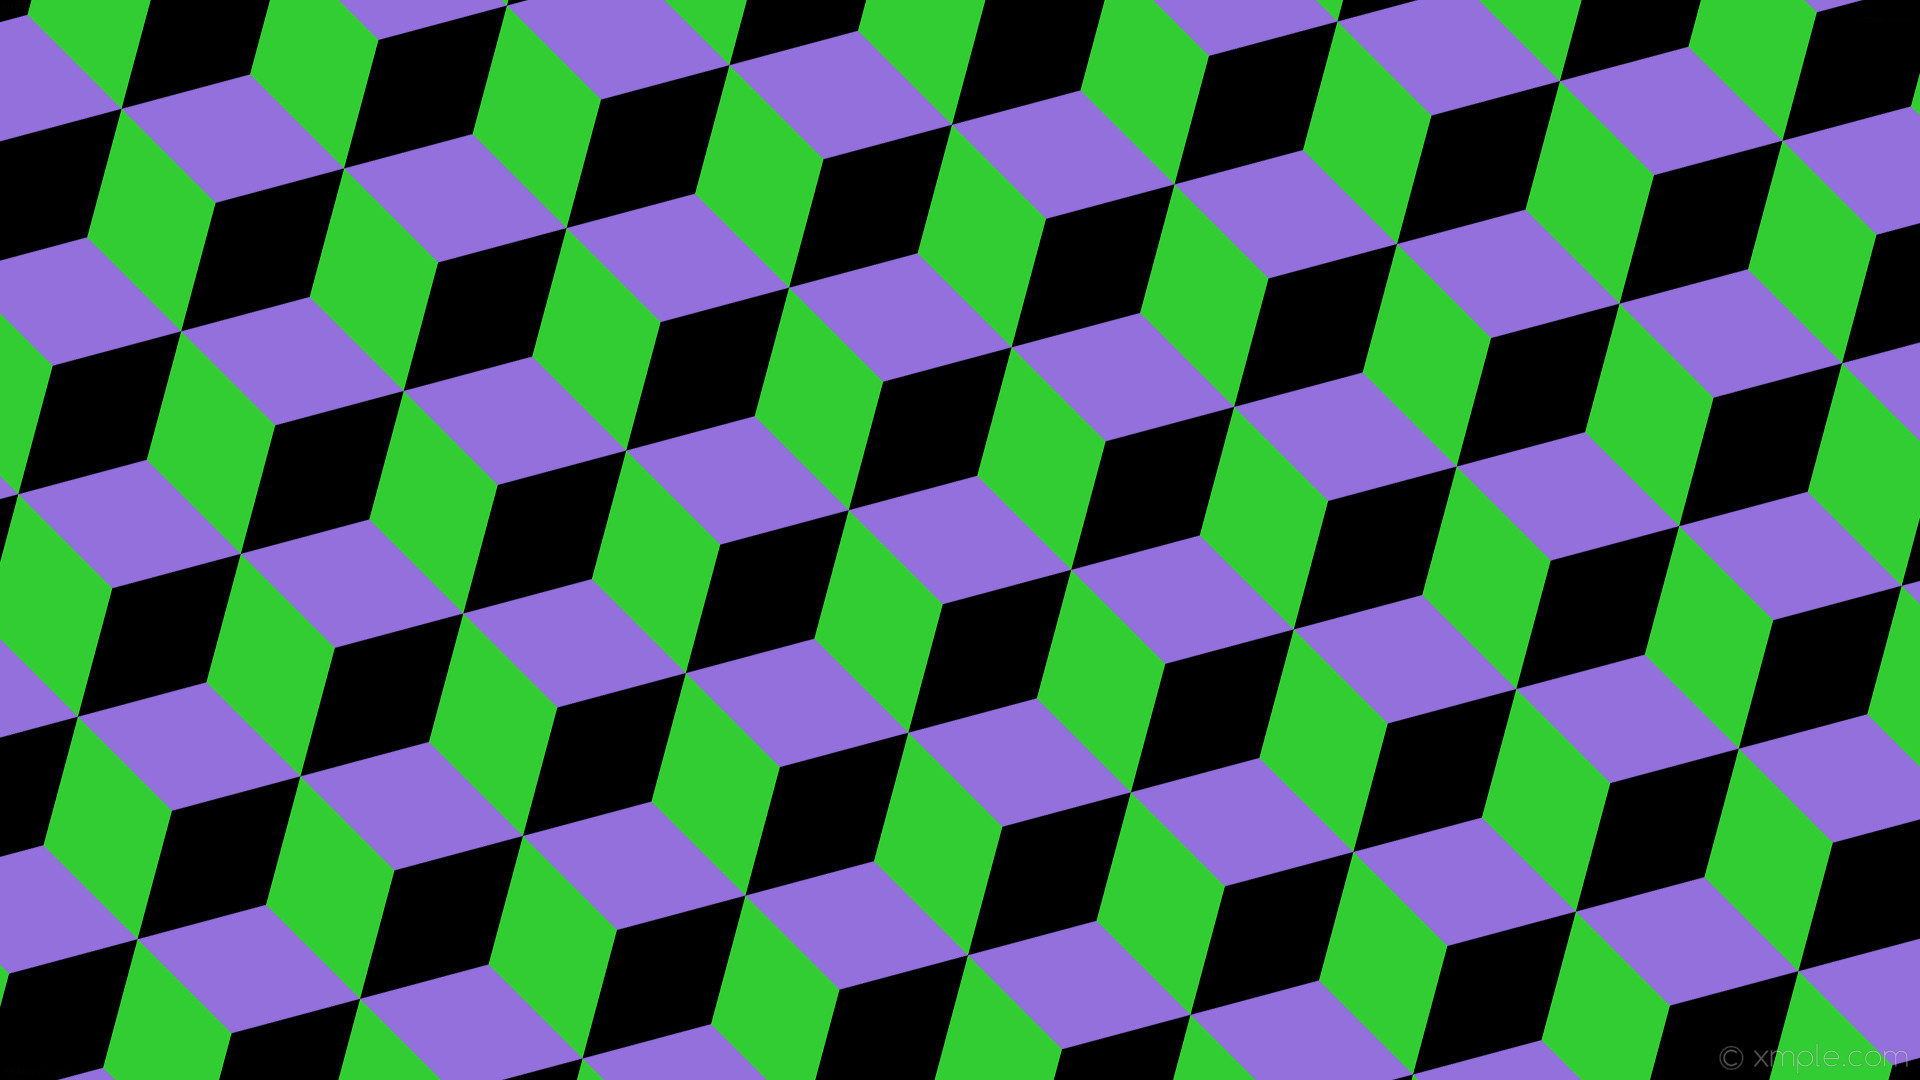 wallpaper black green 3d cubes purple medium purple lime green #9370db  #32cd32 #000000